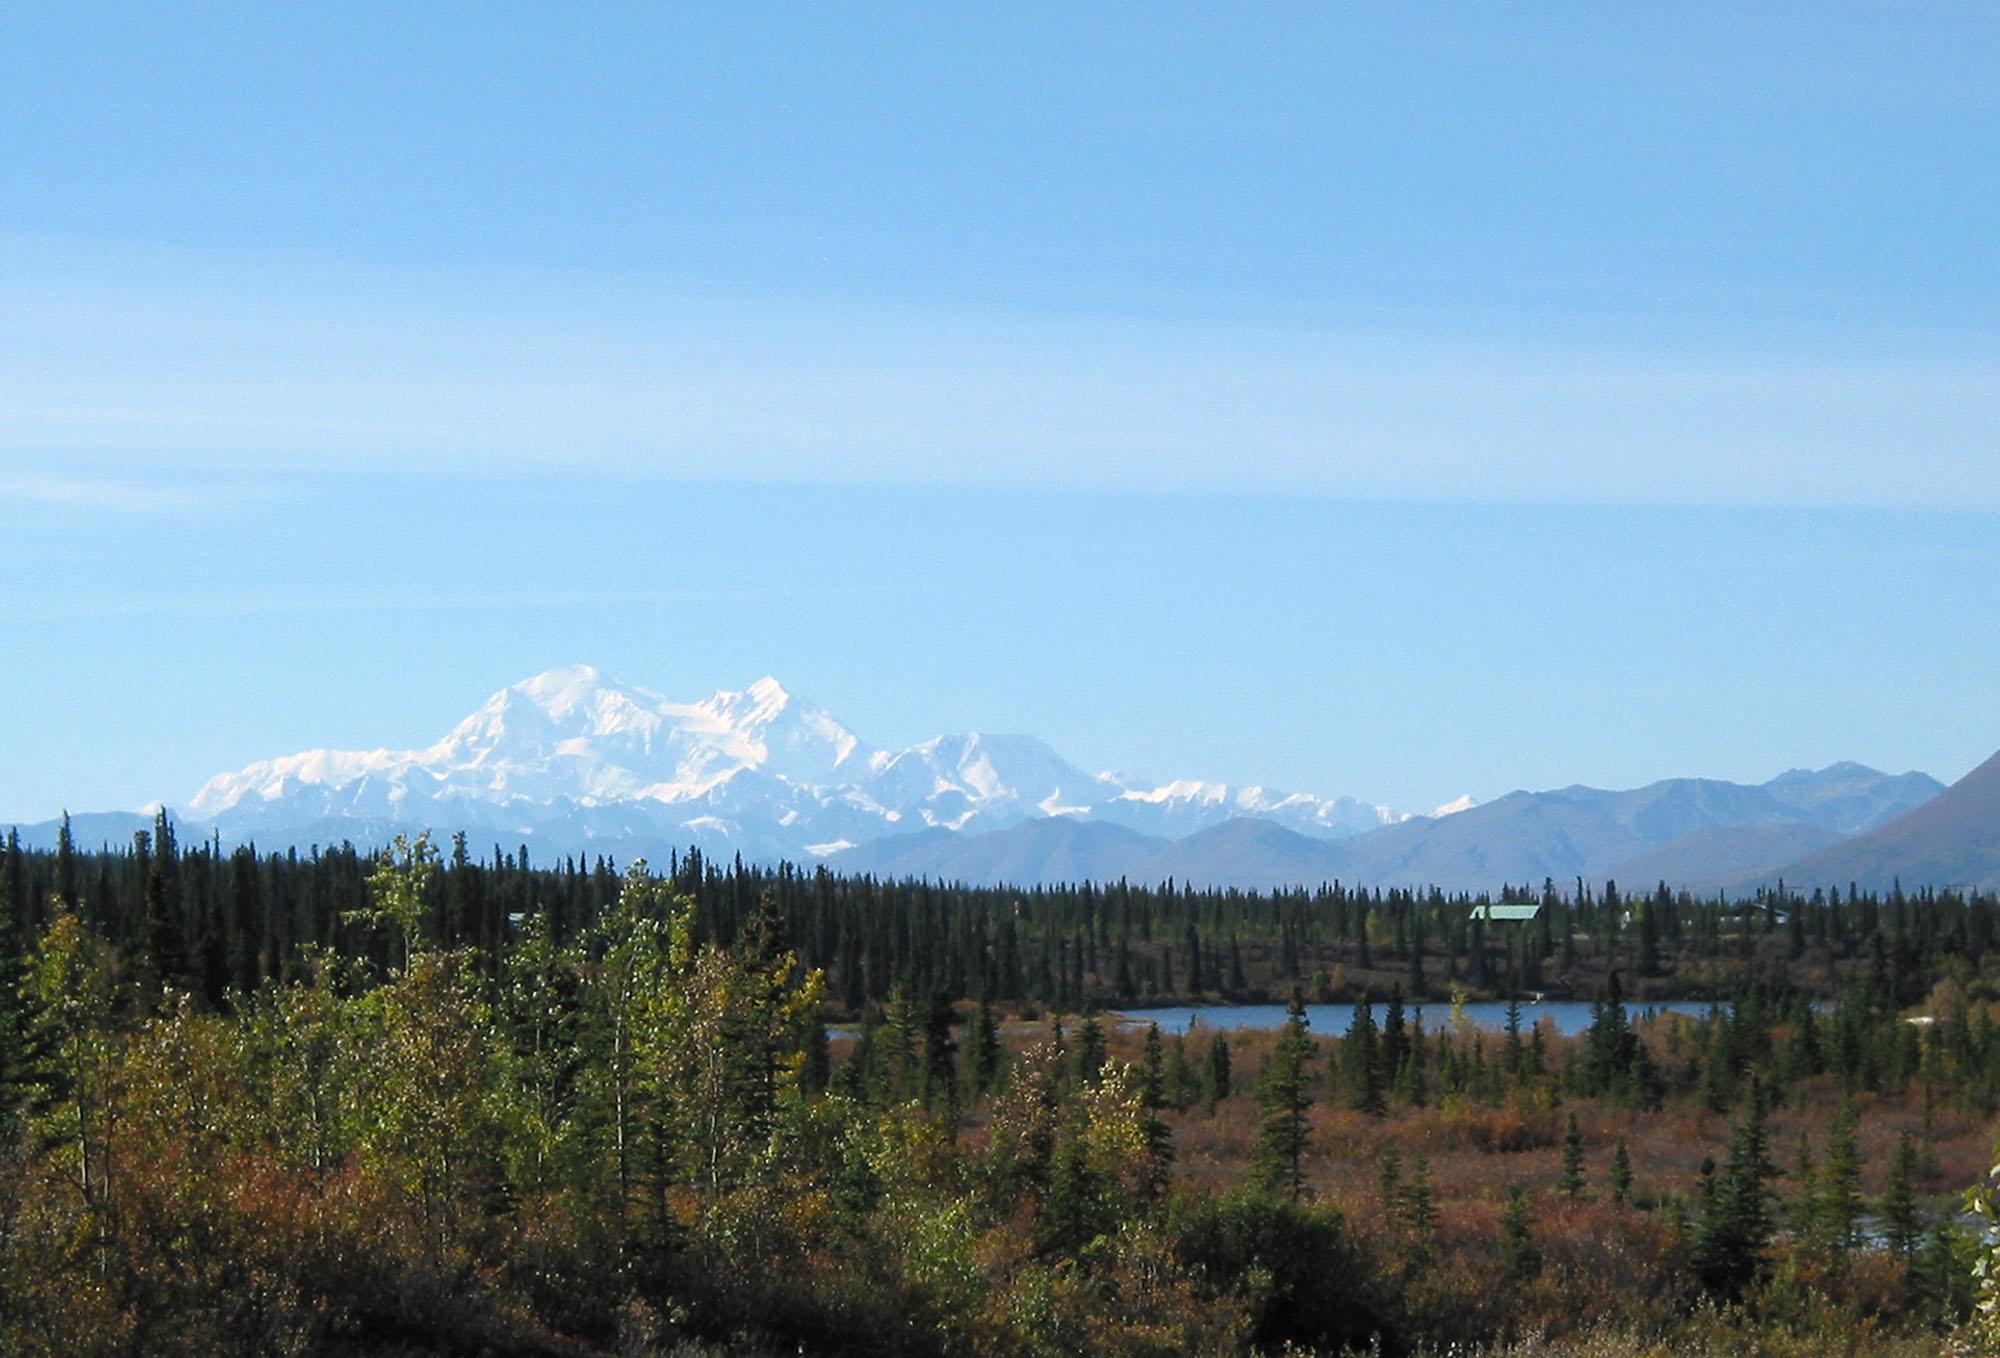 2004 Alaska Mount McKinley Denali